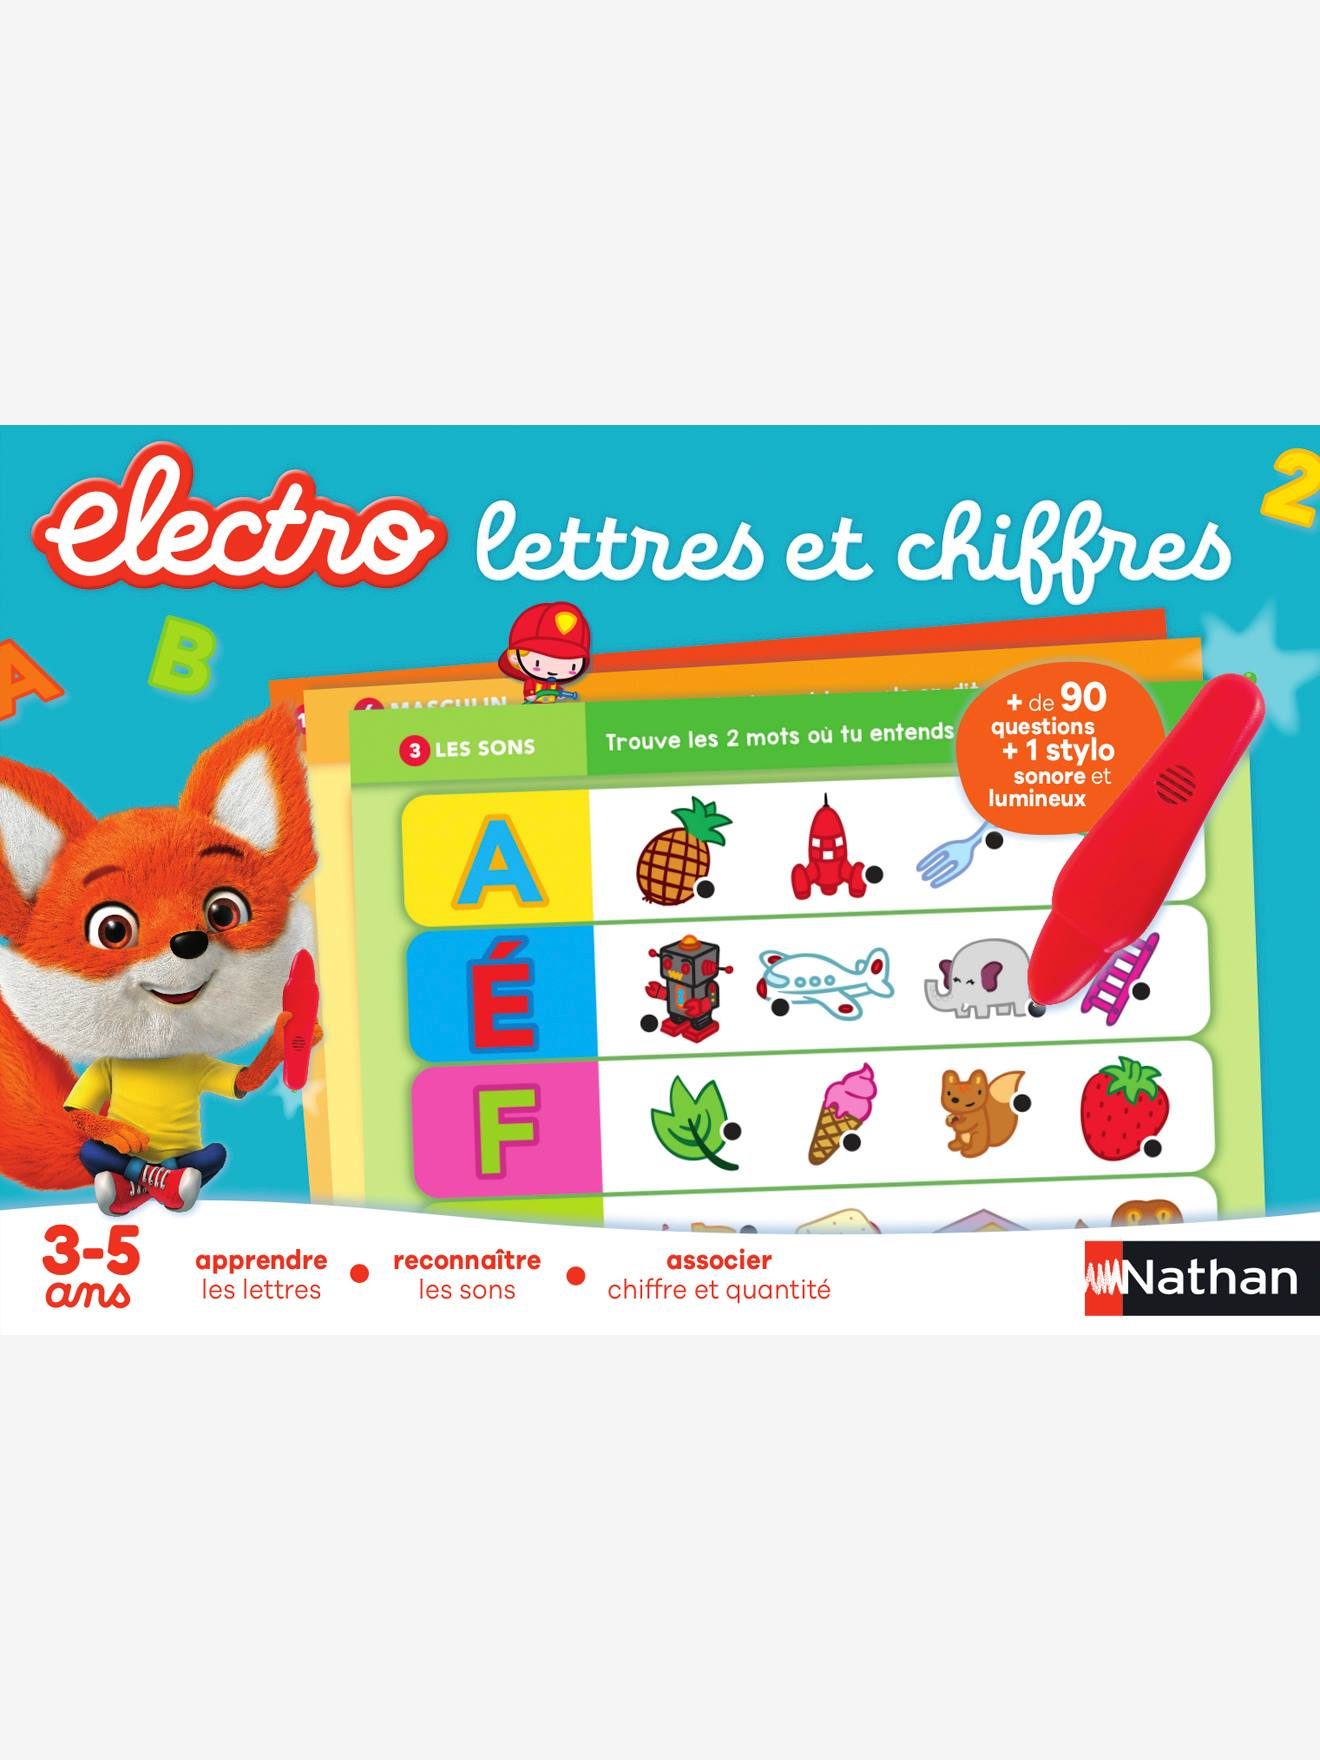 Electro lettres et chiffres NATHAN bleu